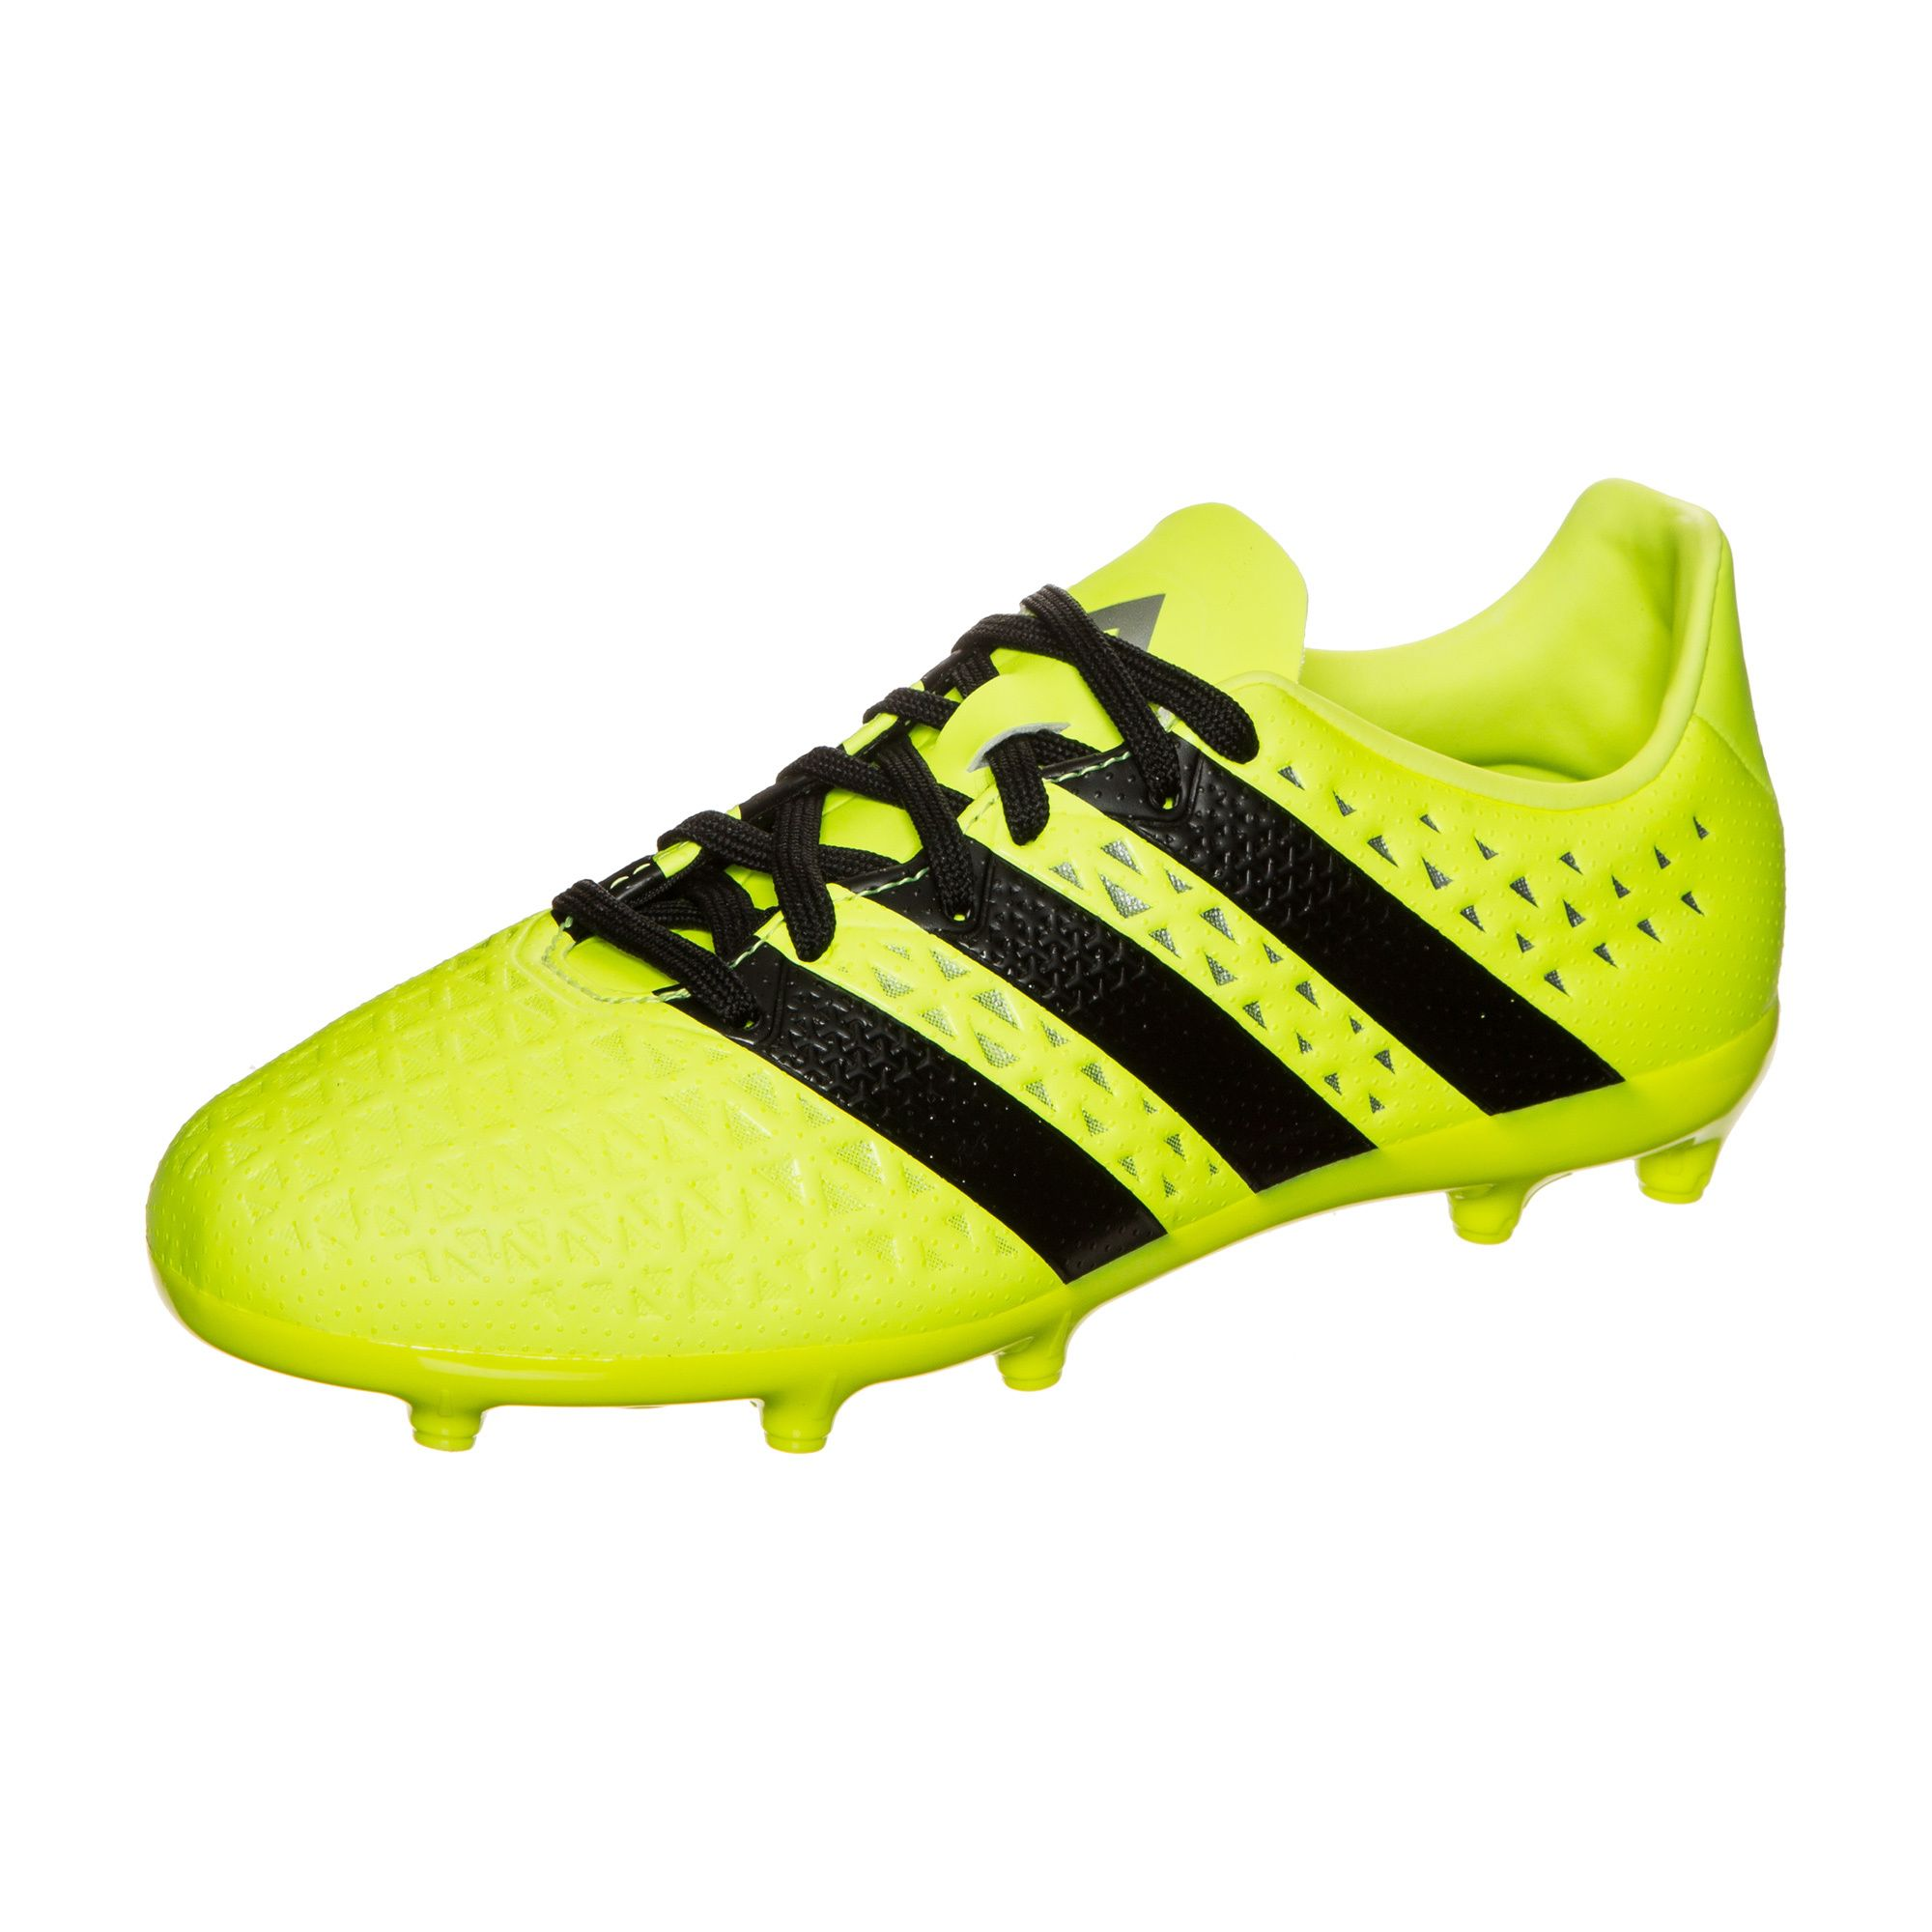 ADIDAS PERFORMANCE adidas Performance ACE 16.3 FG Fußballschuh Kinder